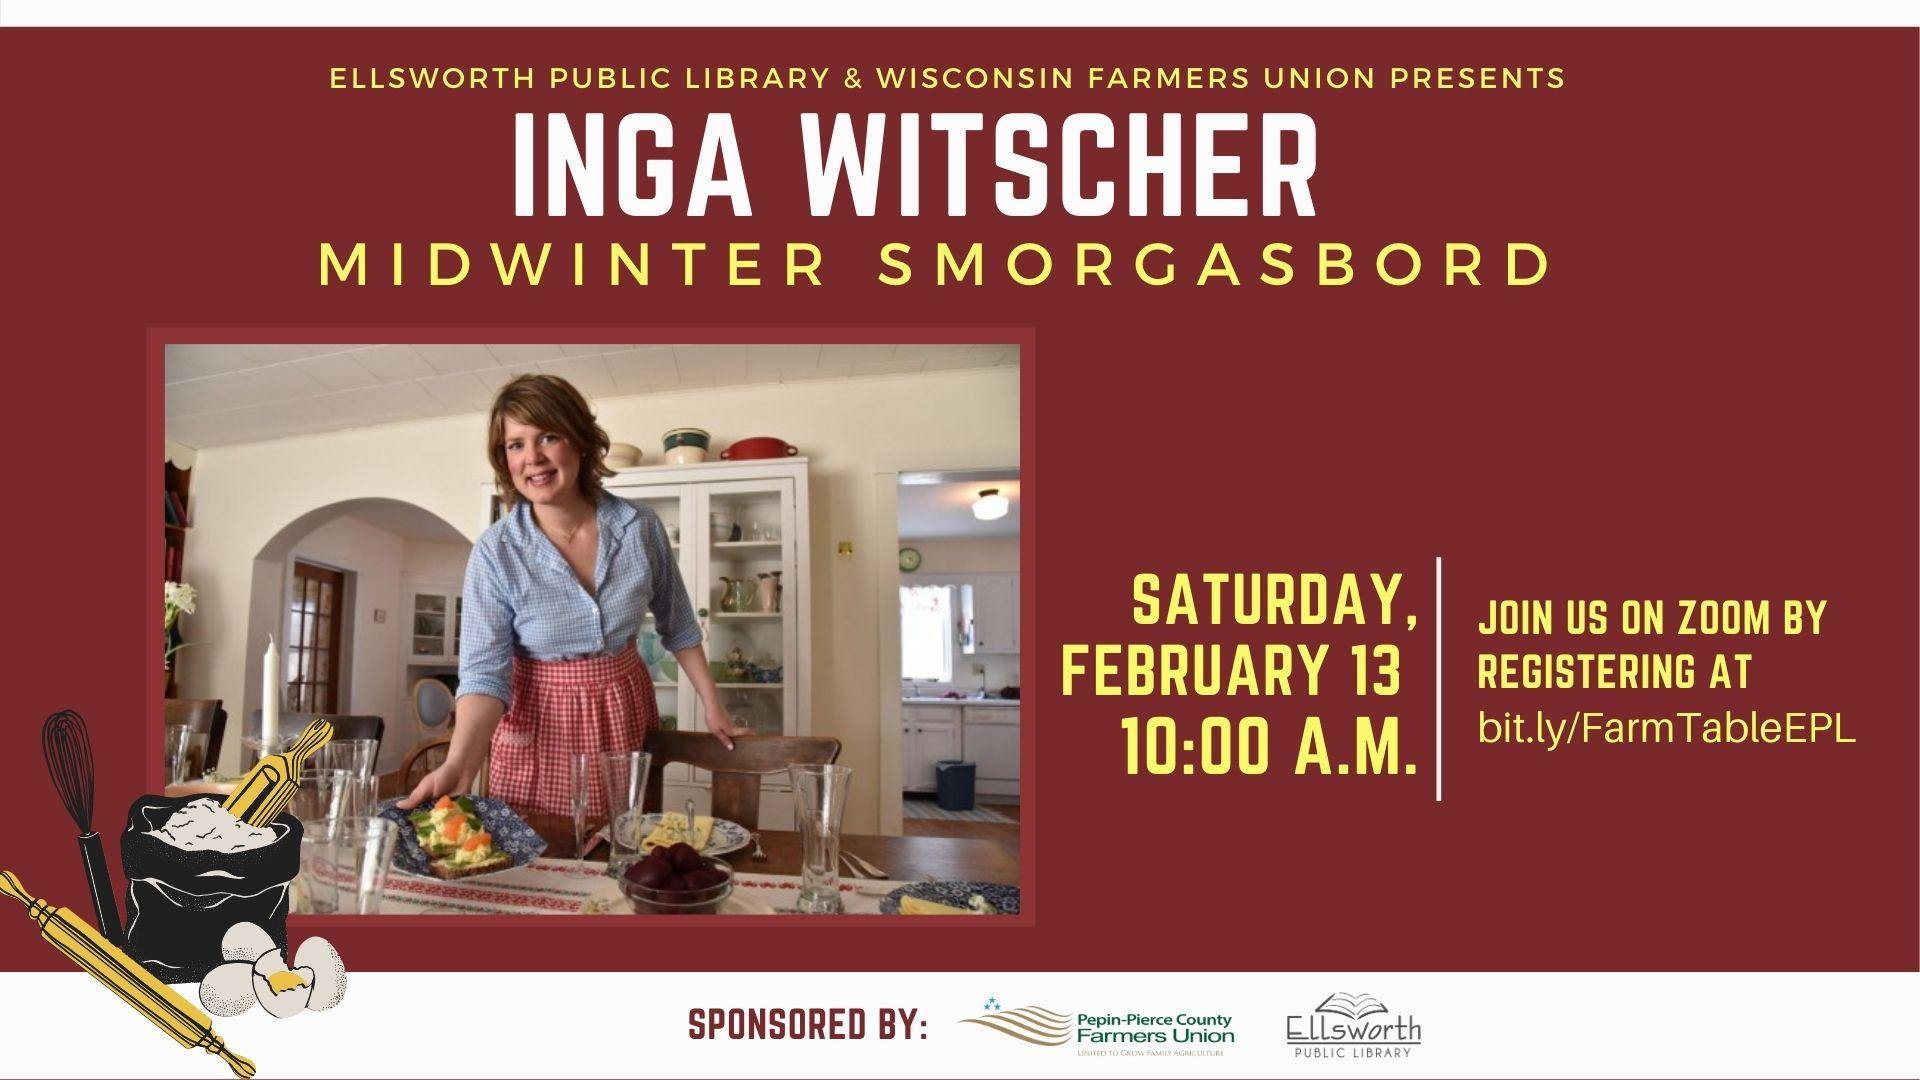 Inga Witscher: Midwinter Smorgasbord virtual program, Feb 13 at 10 am.